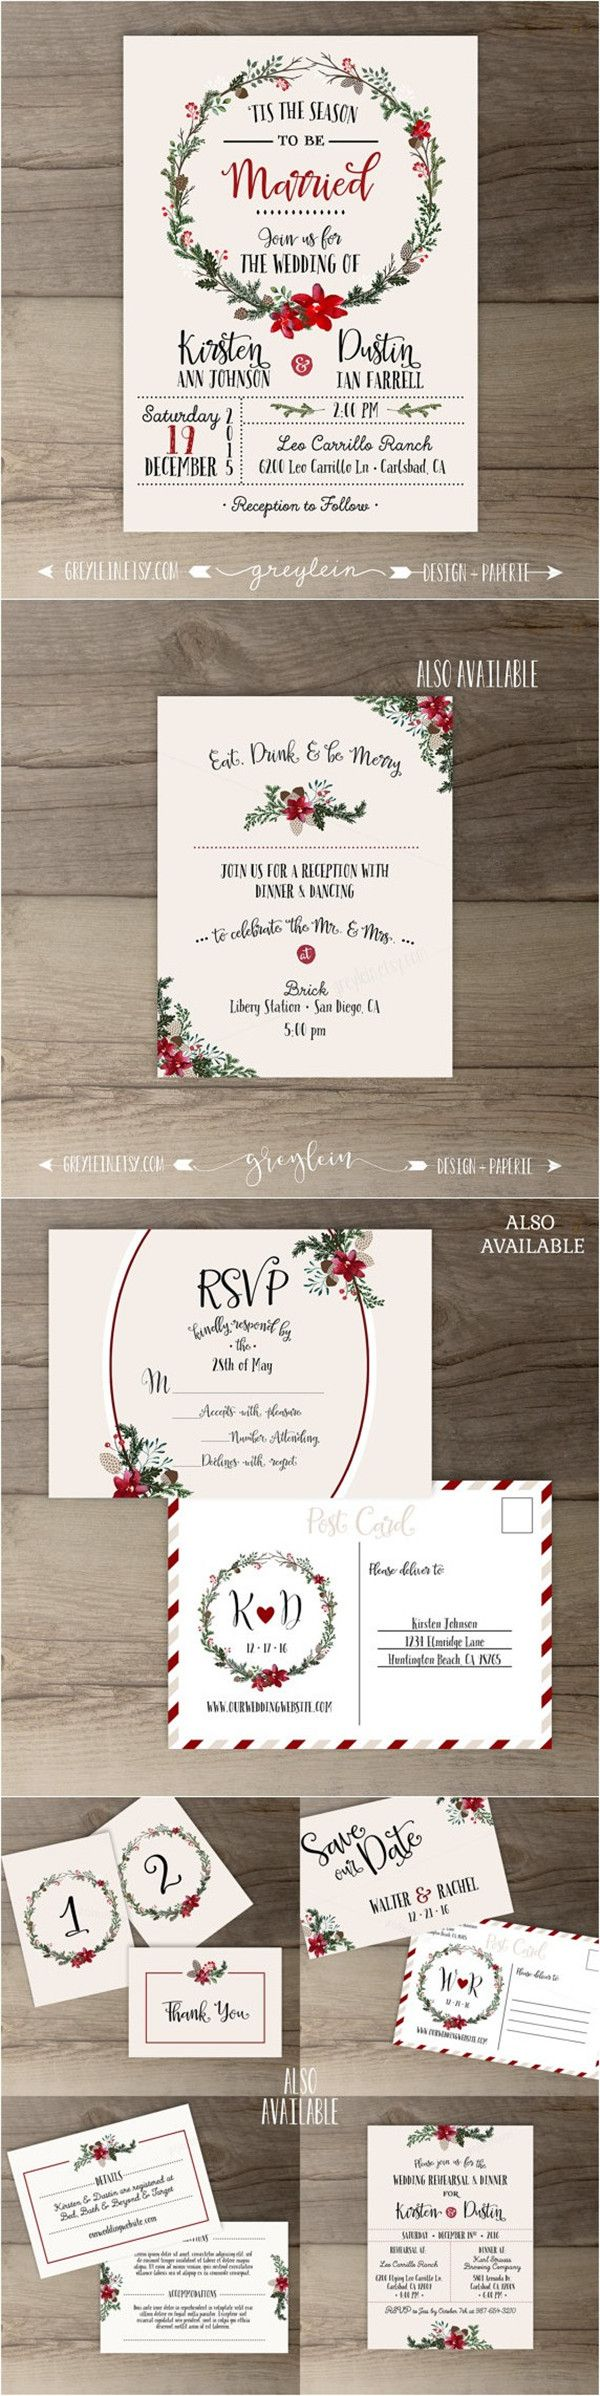 16 Christmas Wedding Ideas You Canu0027t Miss!